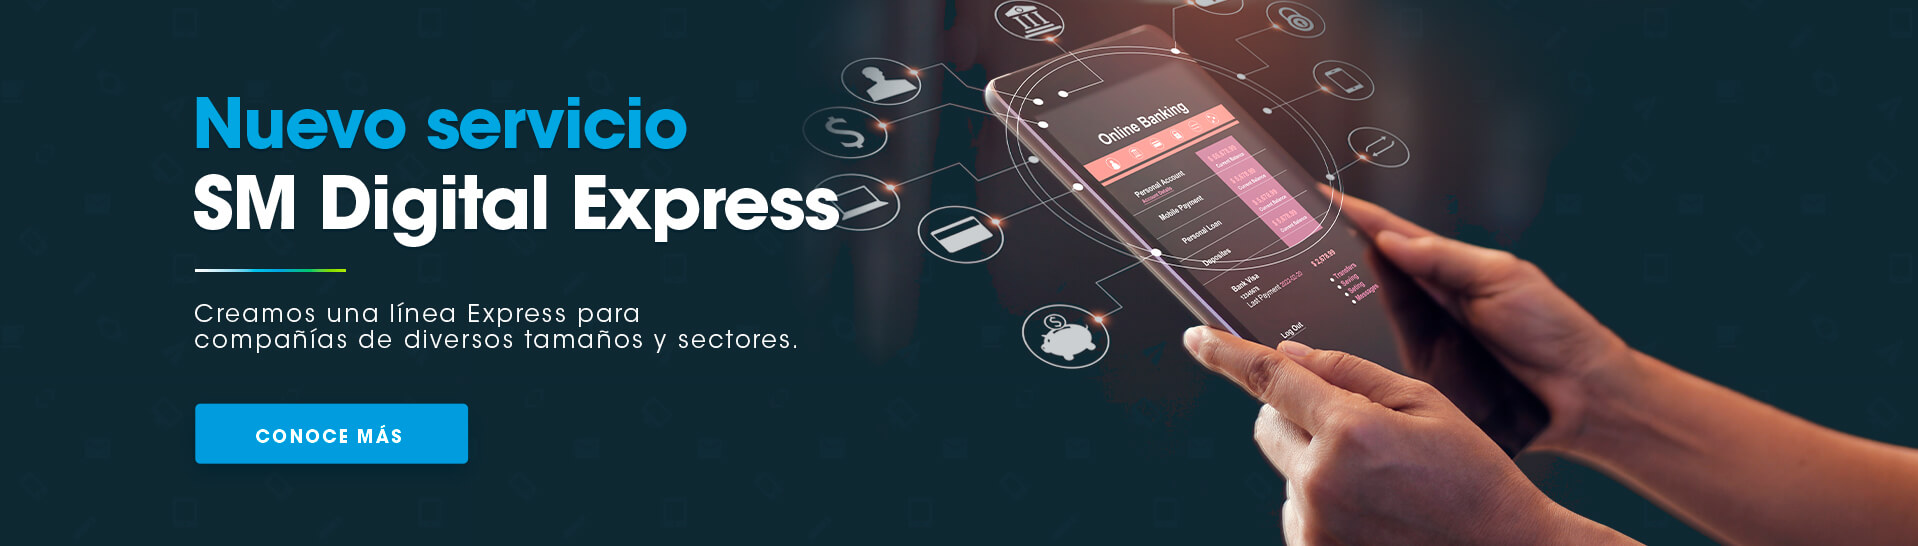 SM Digital Express